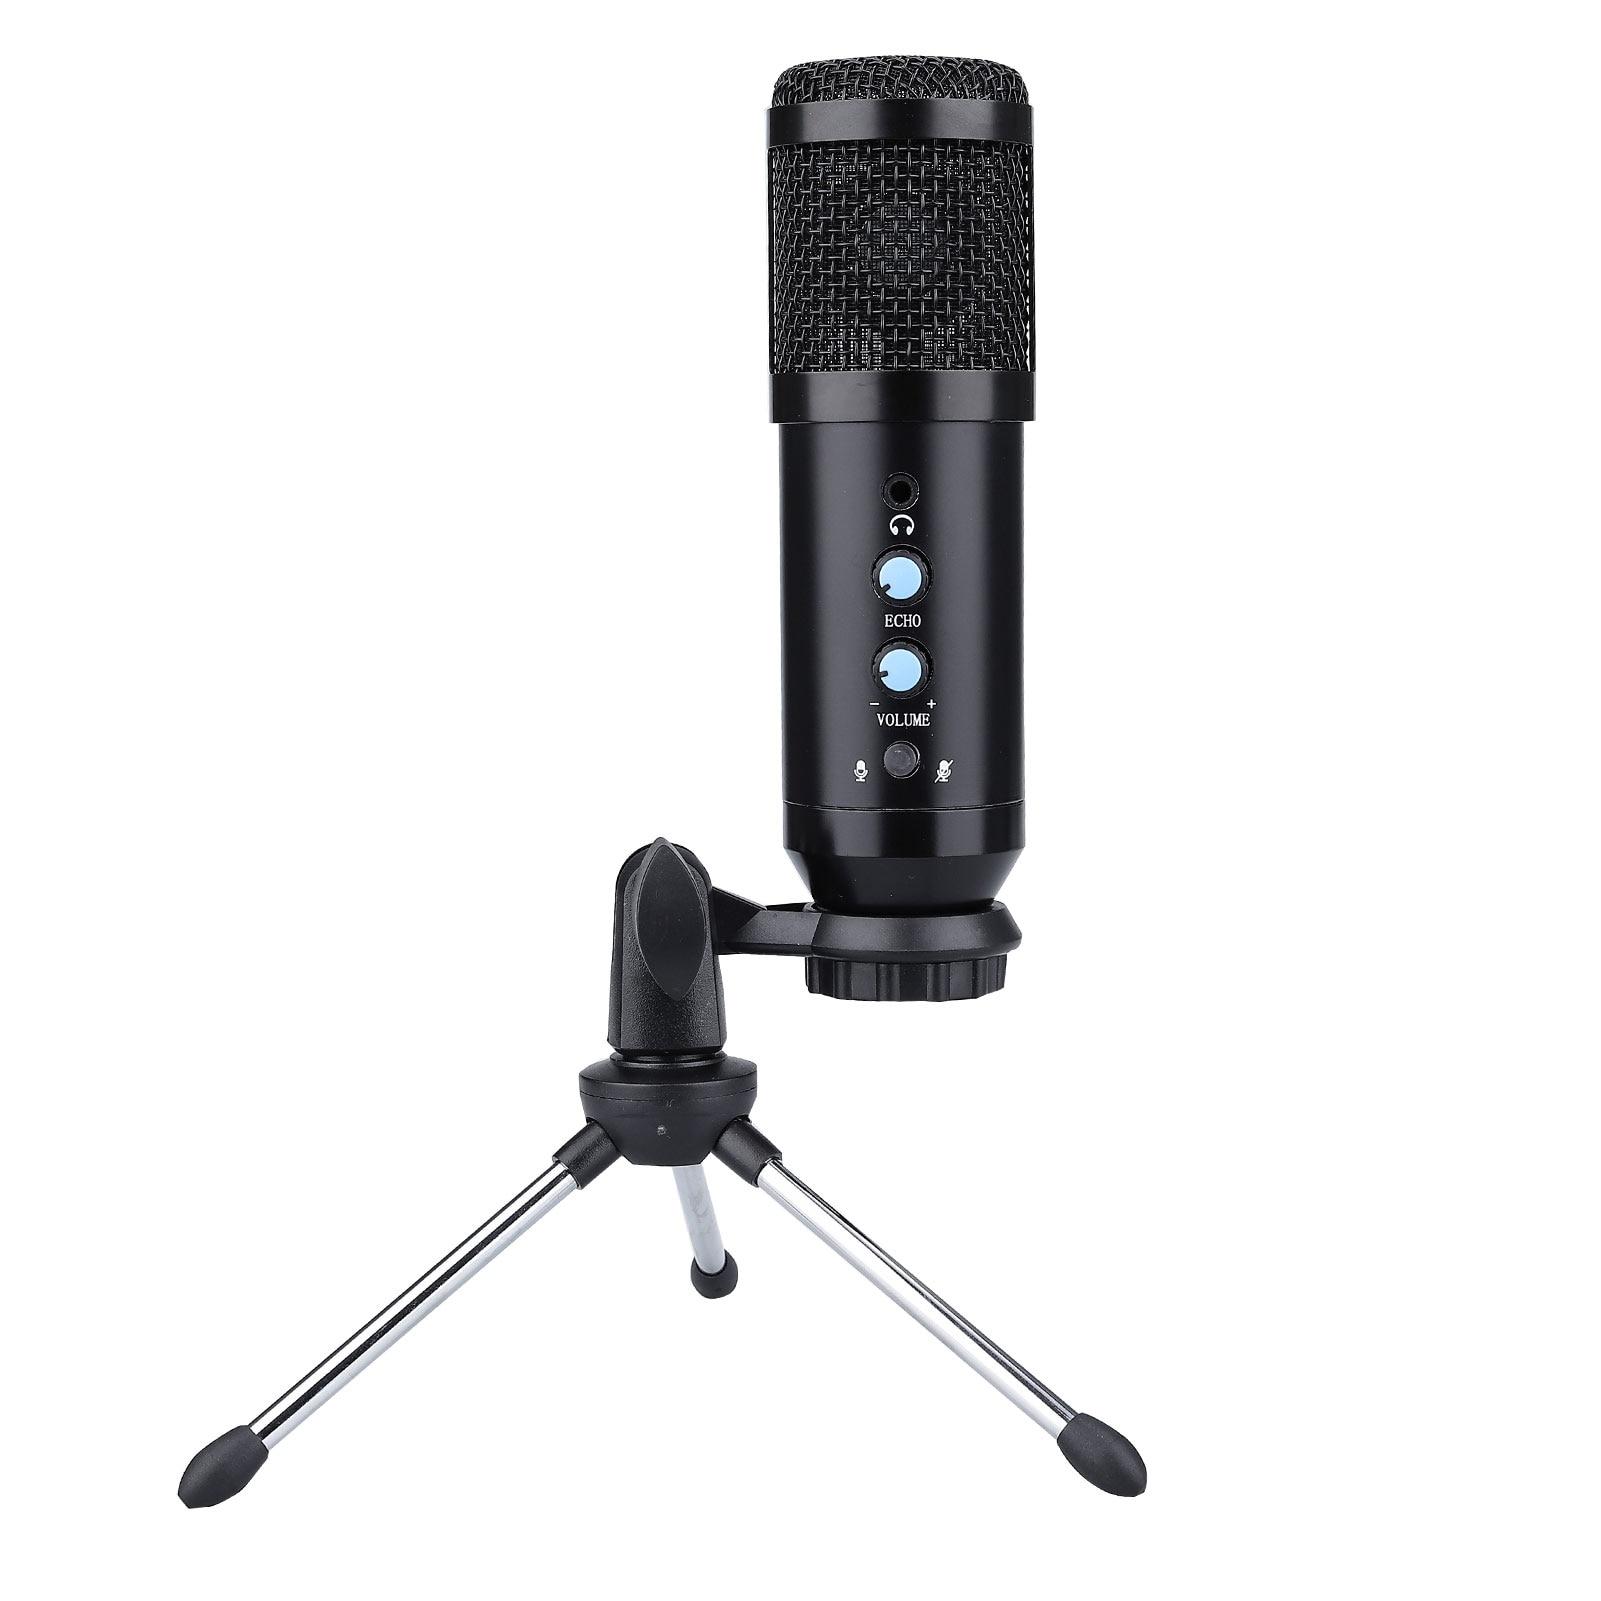 Metal USB Condenser Recording Microphone For Laptop Windows Cardioid Studio Recording Vocals Voice enlarge